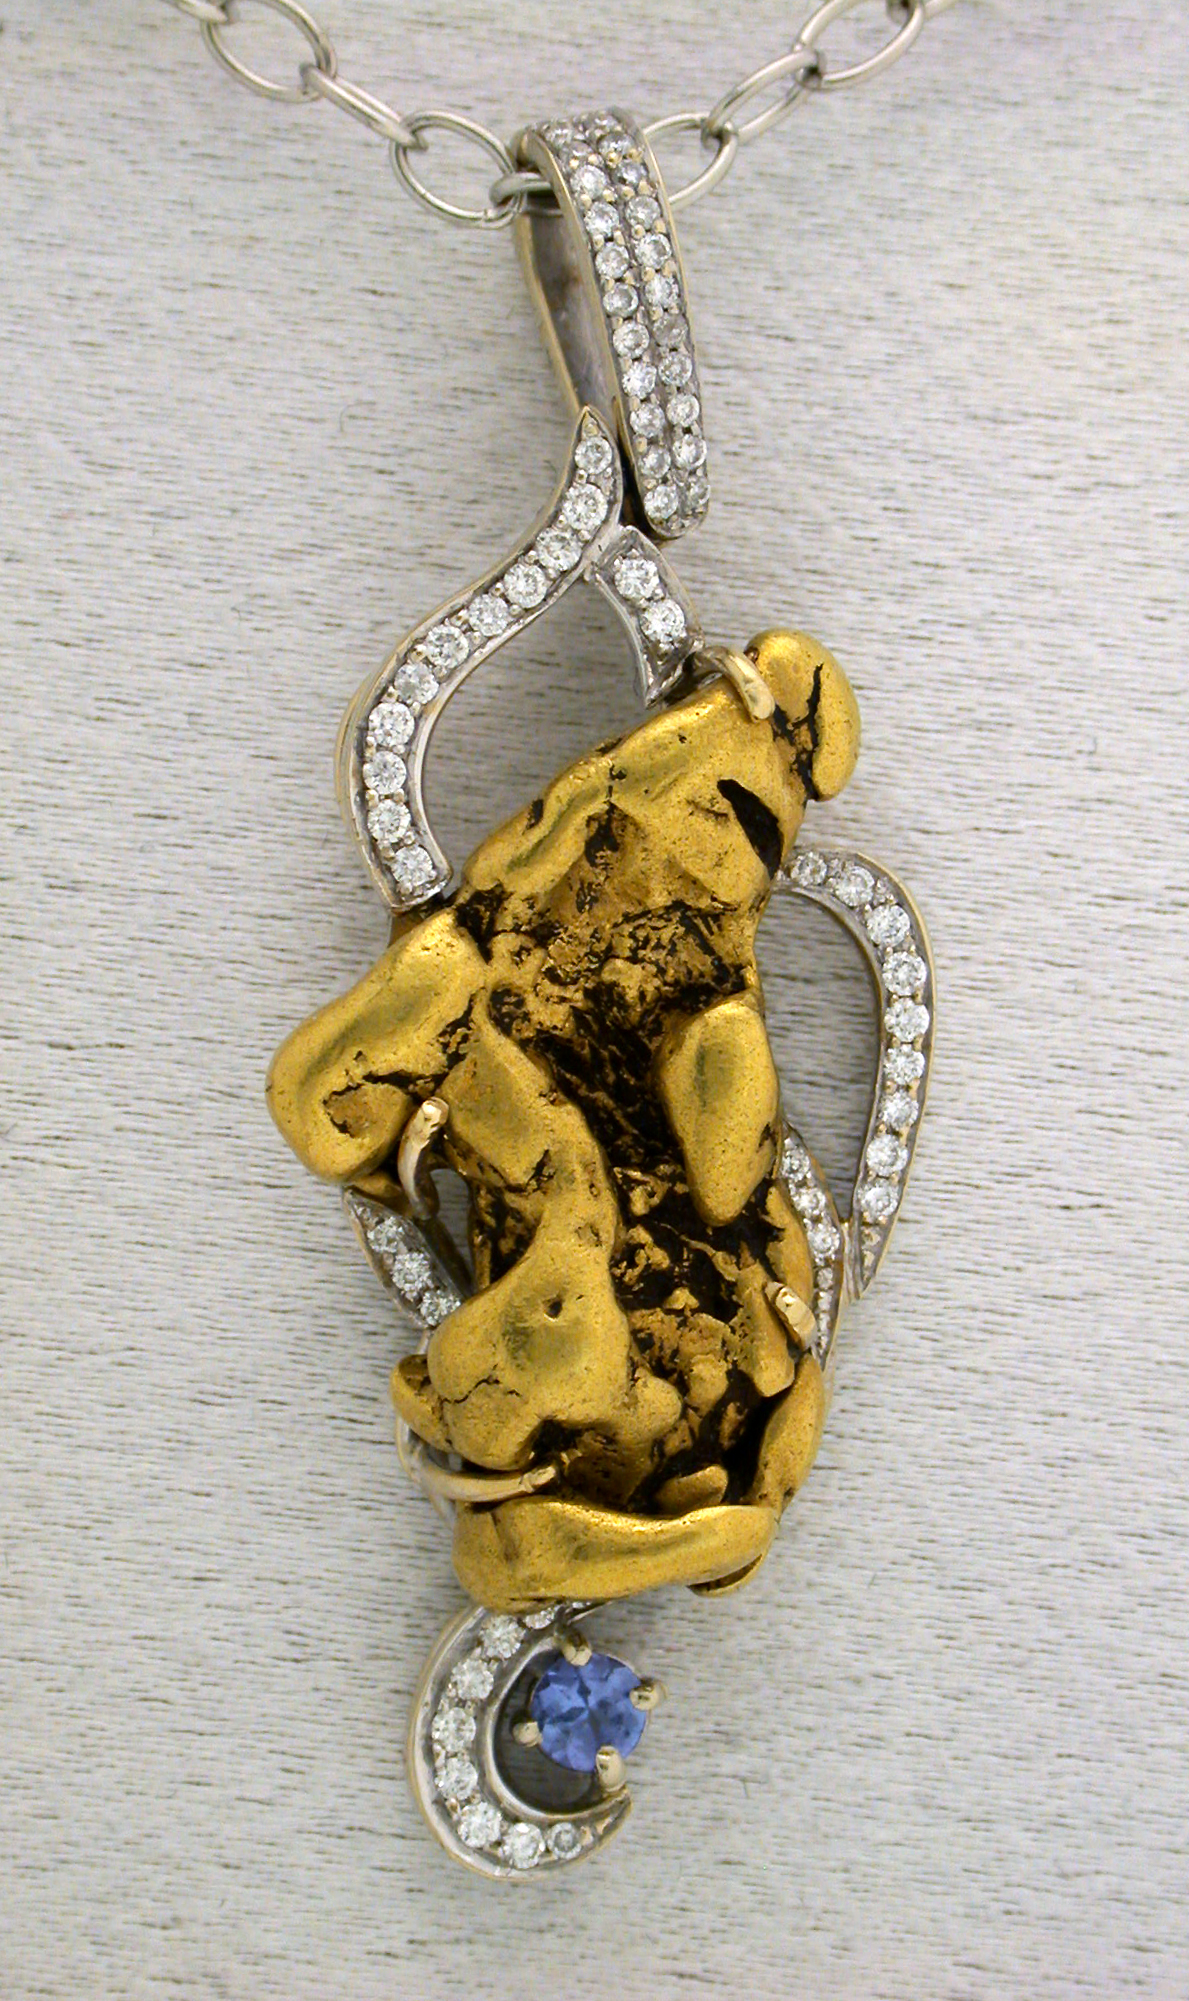 nugget-diamond-piece-from-legacy.jpg